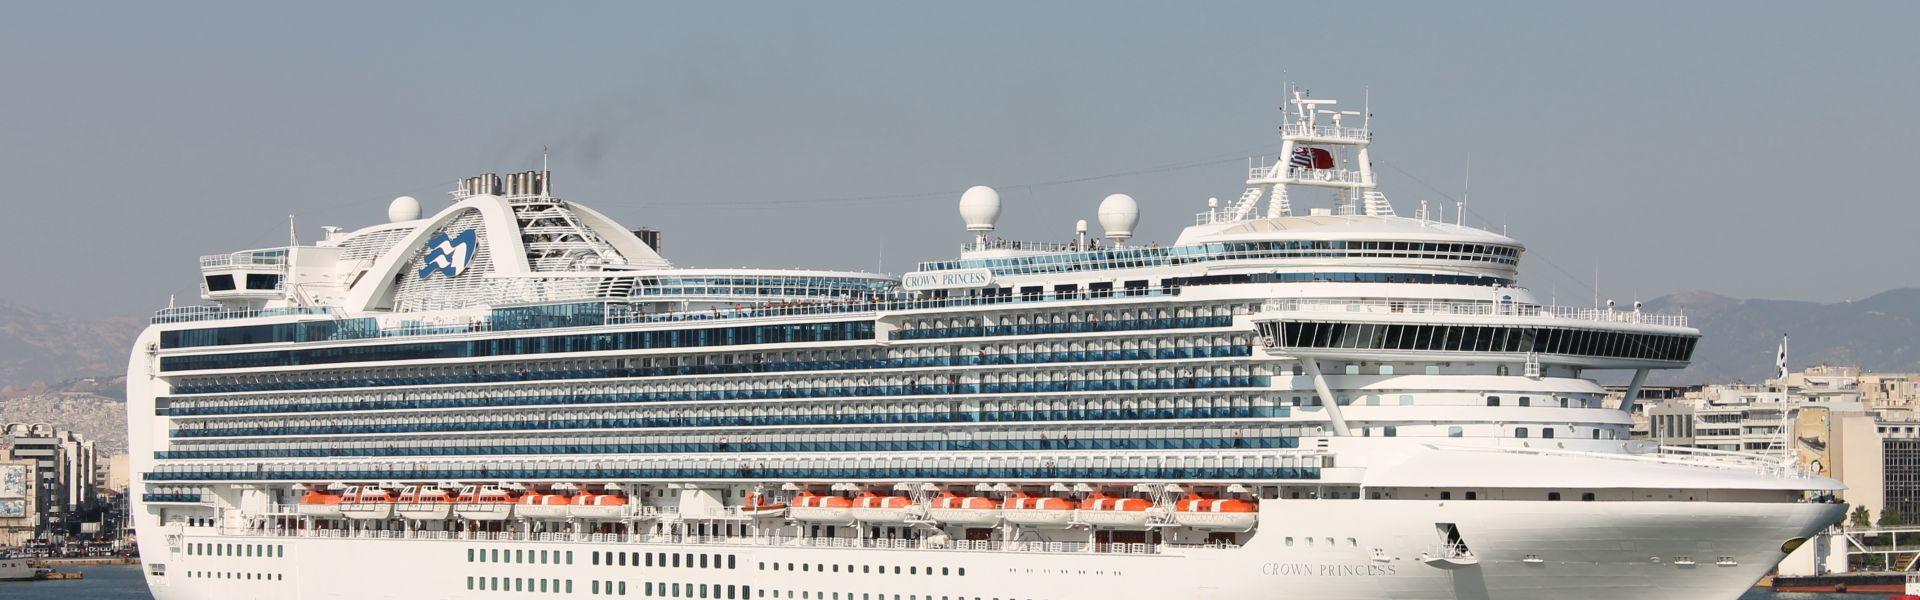 Croaziera 2018 - Mediterana de Vest (Barcelona) - Princess Cruises - Crown Princess - 7 nopti